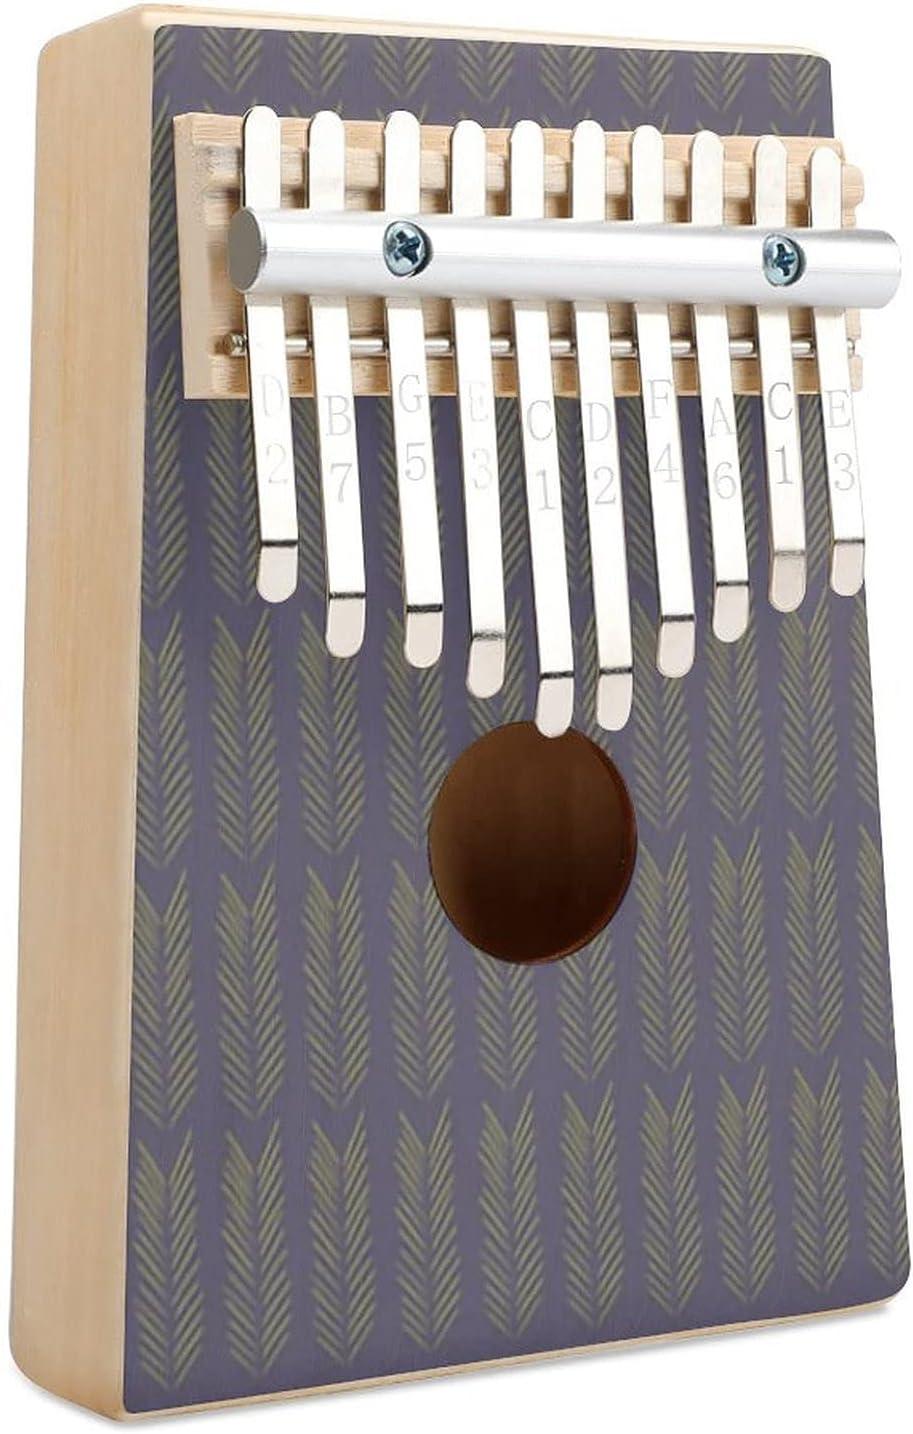 Pattern 3 Kalimba Thumb Piano Finger Ins 10 Key Special price Rare Musical